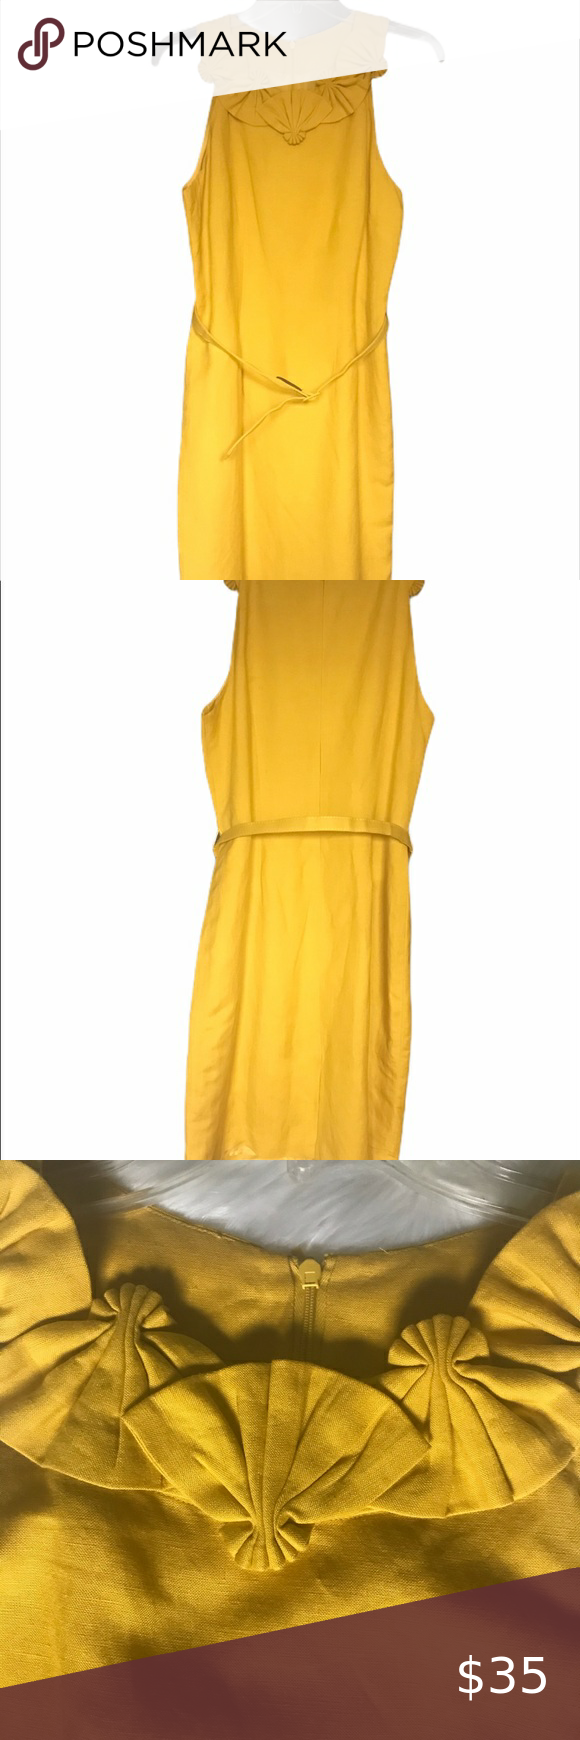 Jessica Howard Sunflower Yellow Dress With Belt Yellow Dress Mustard Yellow Dresses Dresses [ 1740 x 580 Pixel ]